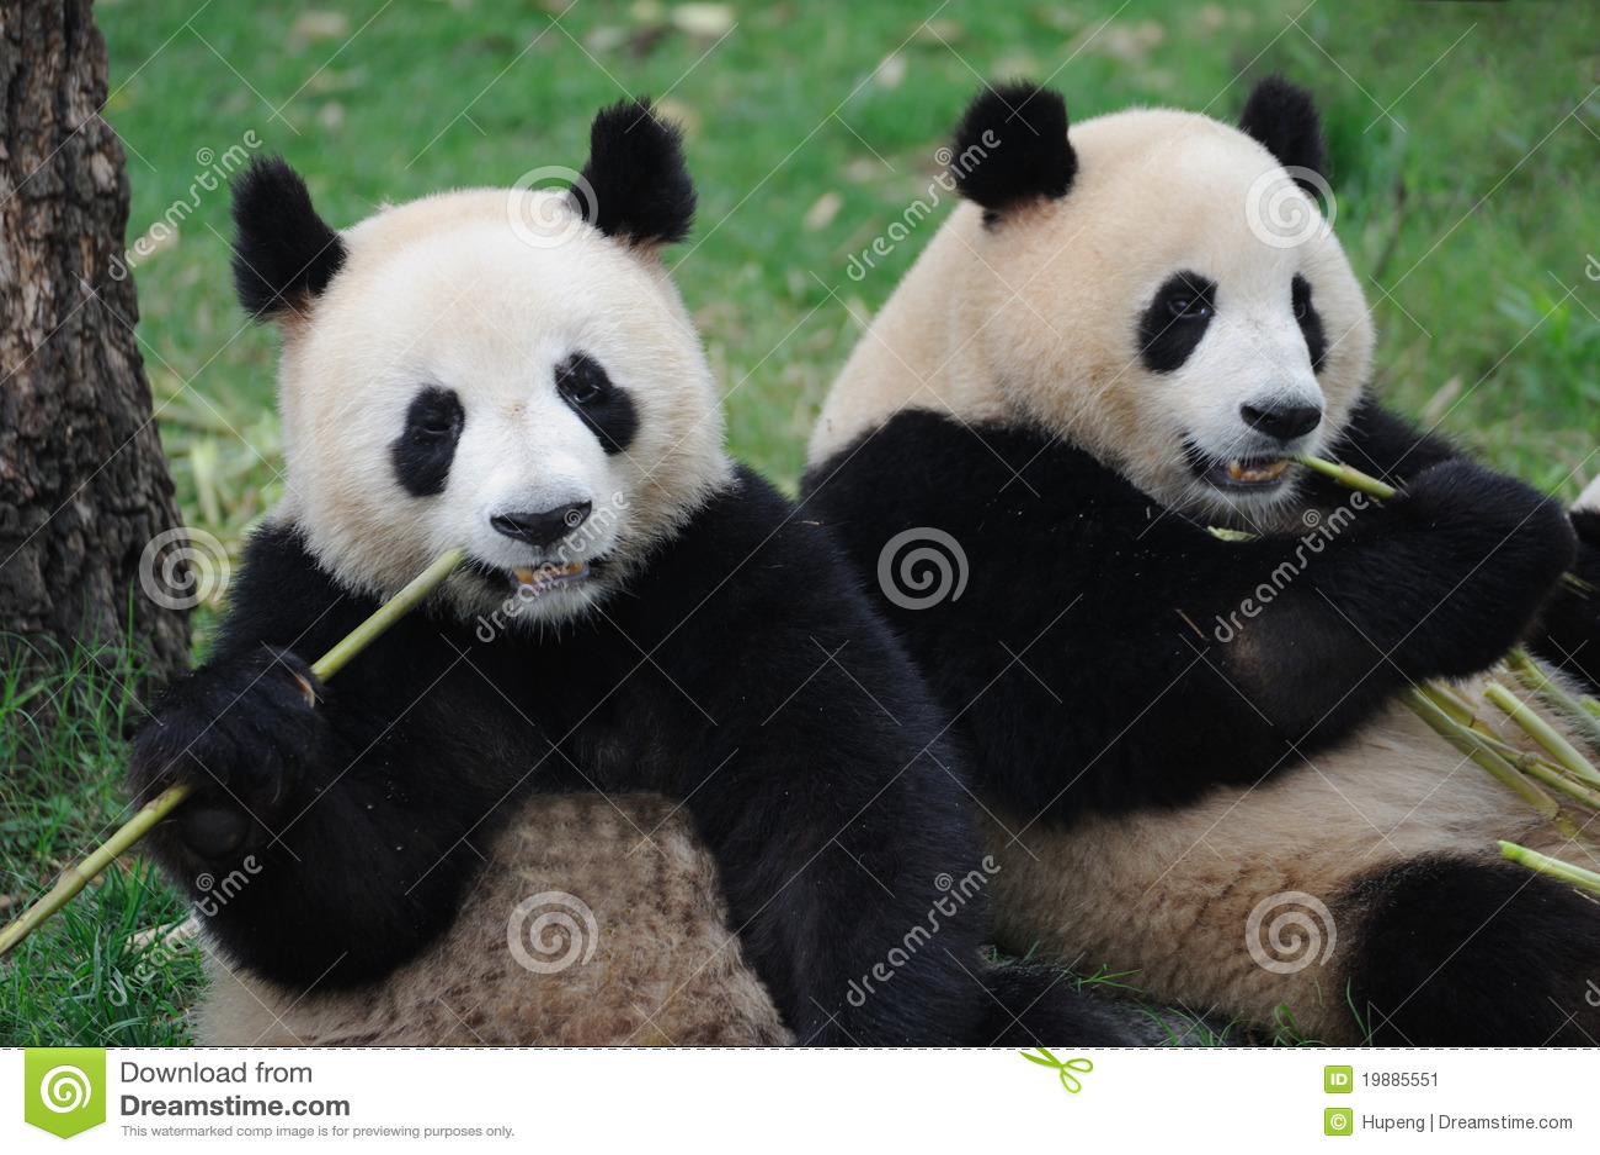 Two lovely pandas eating bamboo